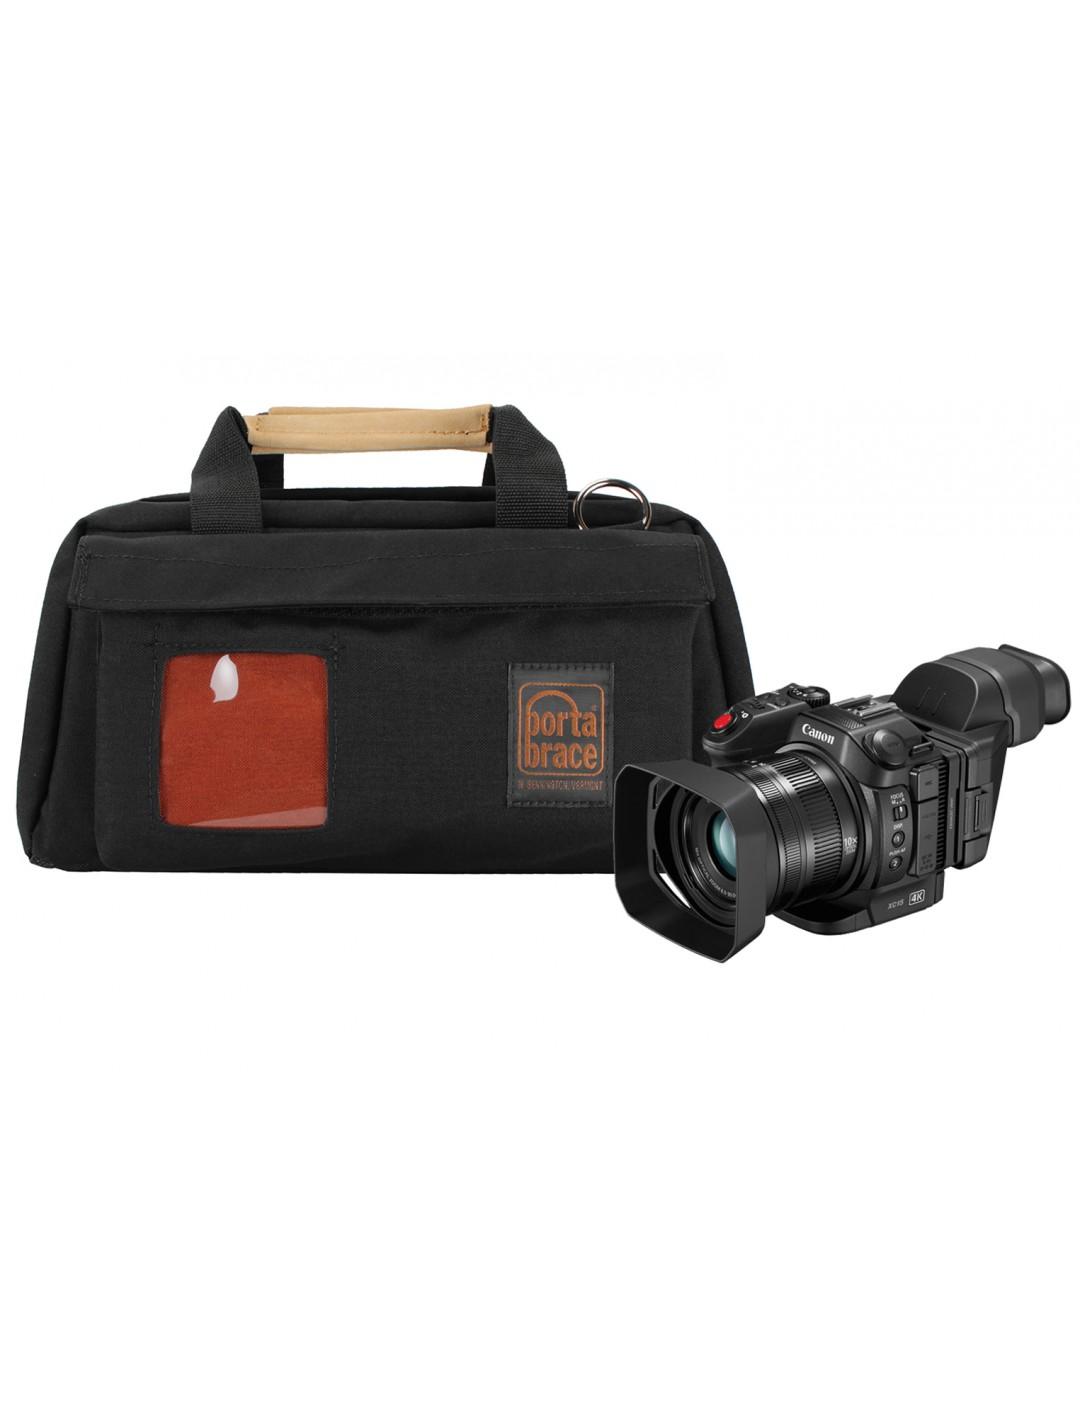 Porta Brace CS-XC15 Saco de Transporte, para Canon XC15, Preto